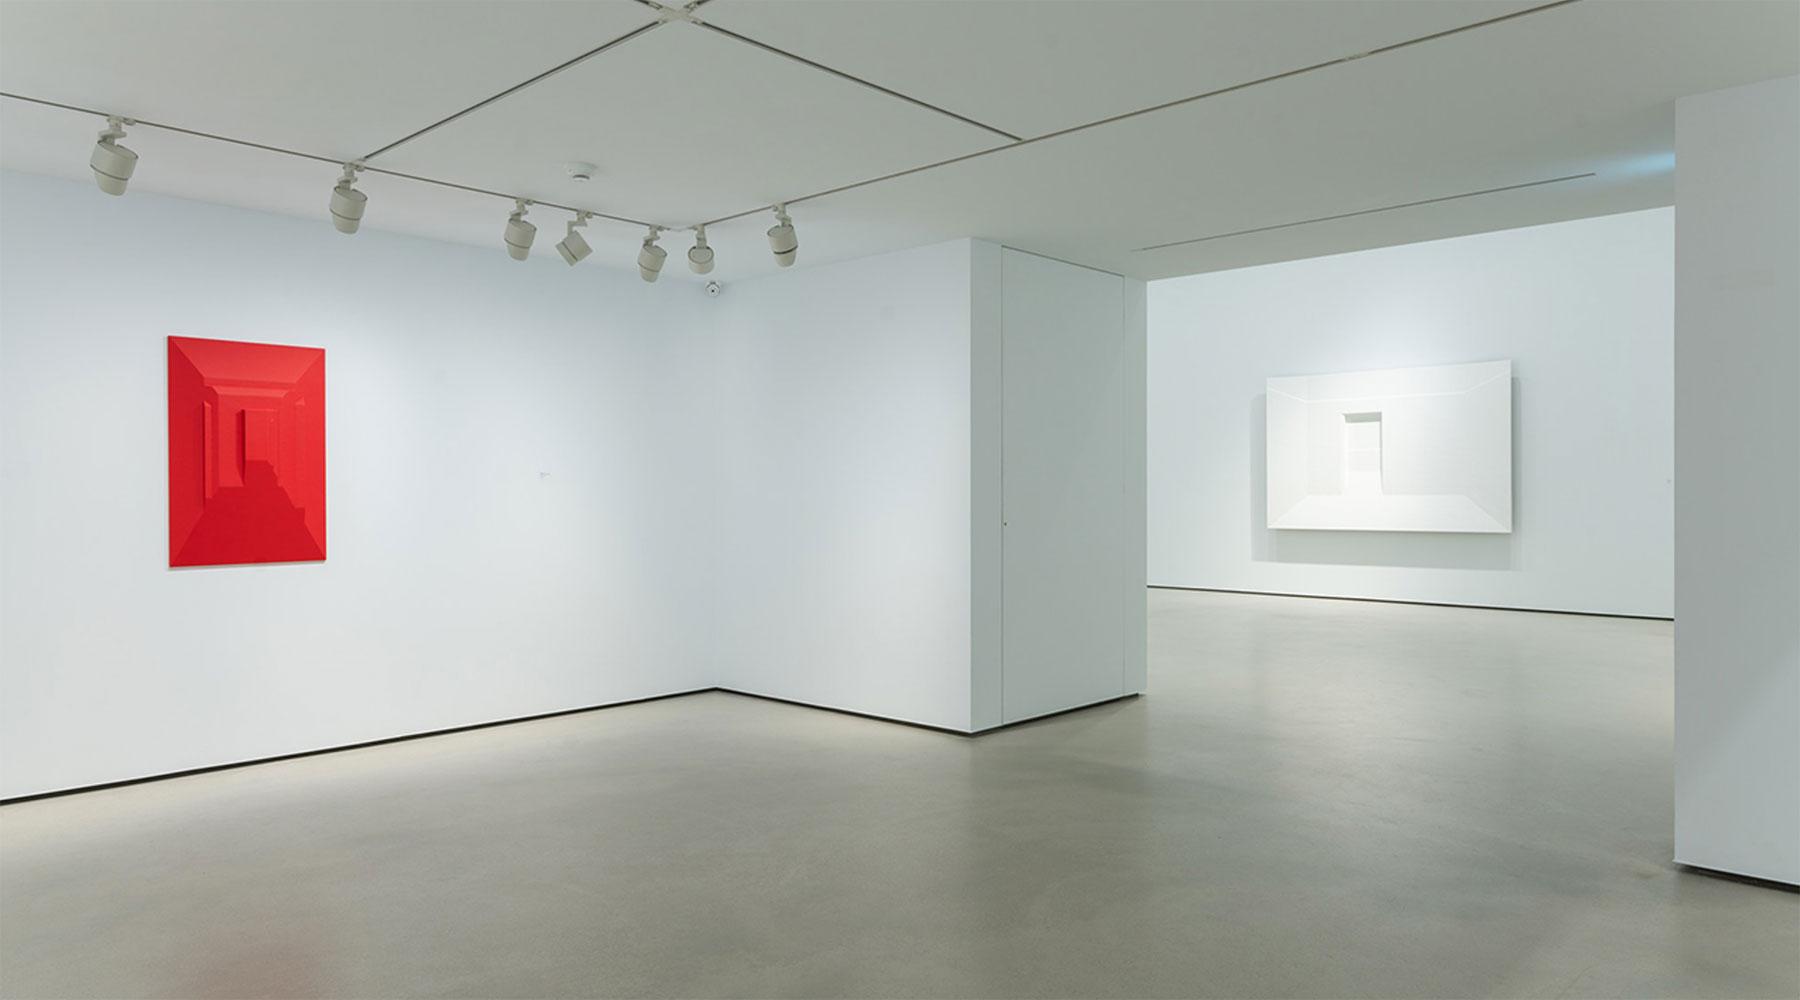 cai-lei-exhibition-2